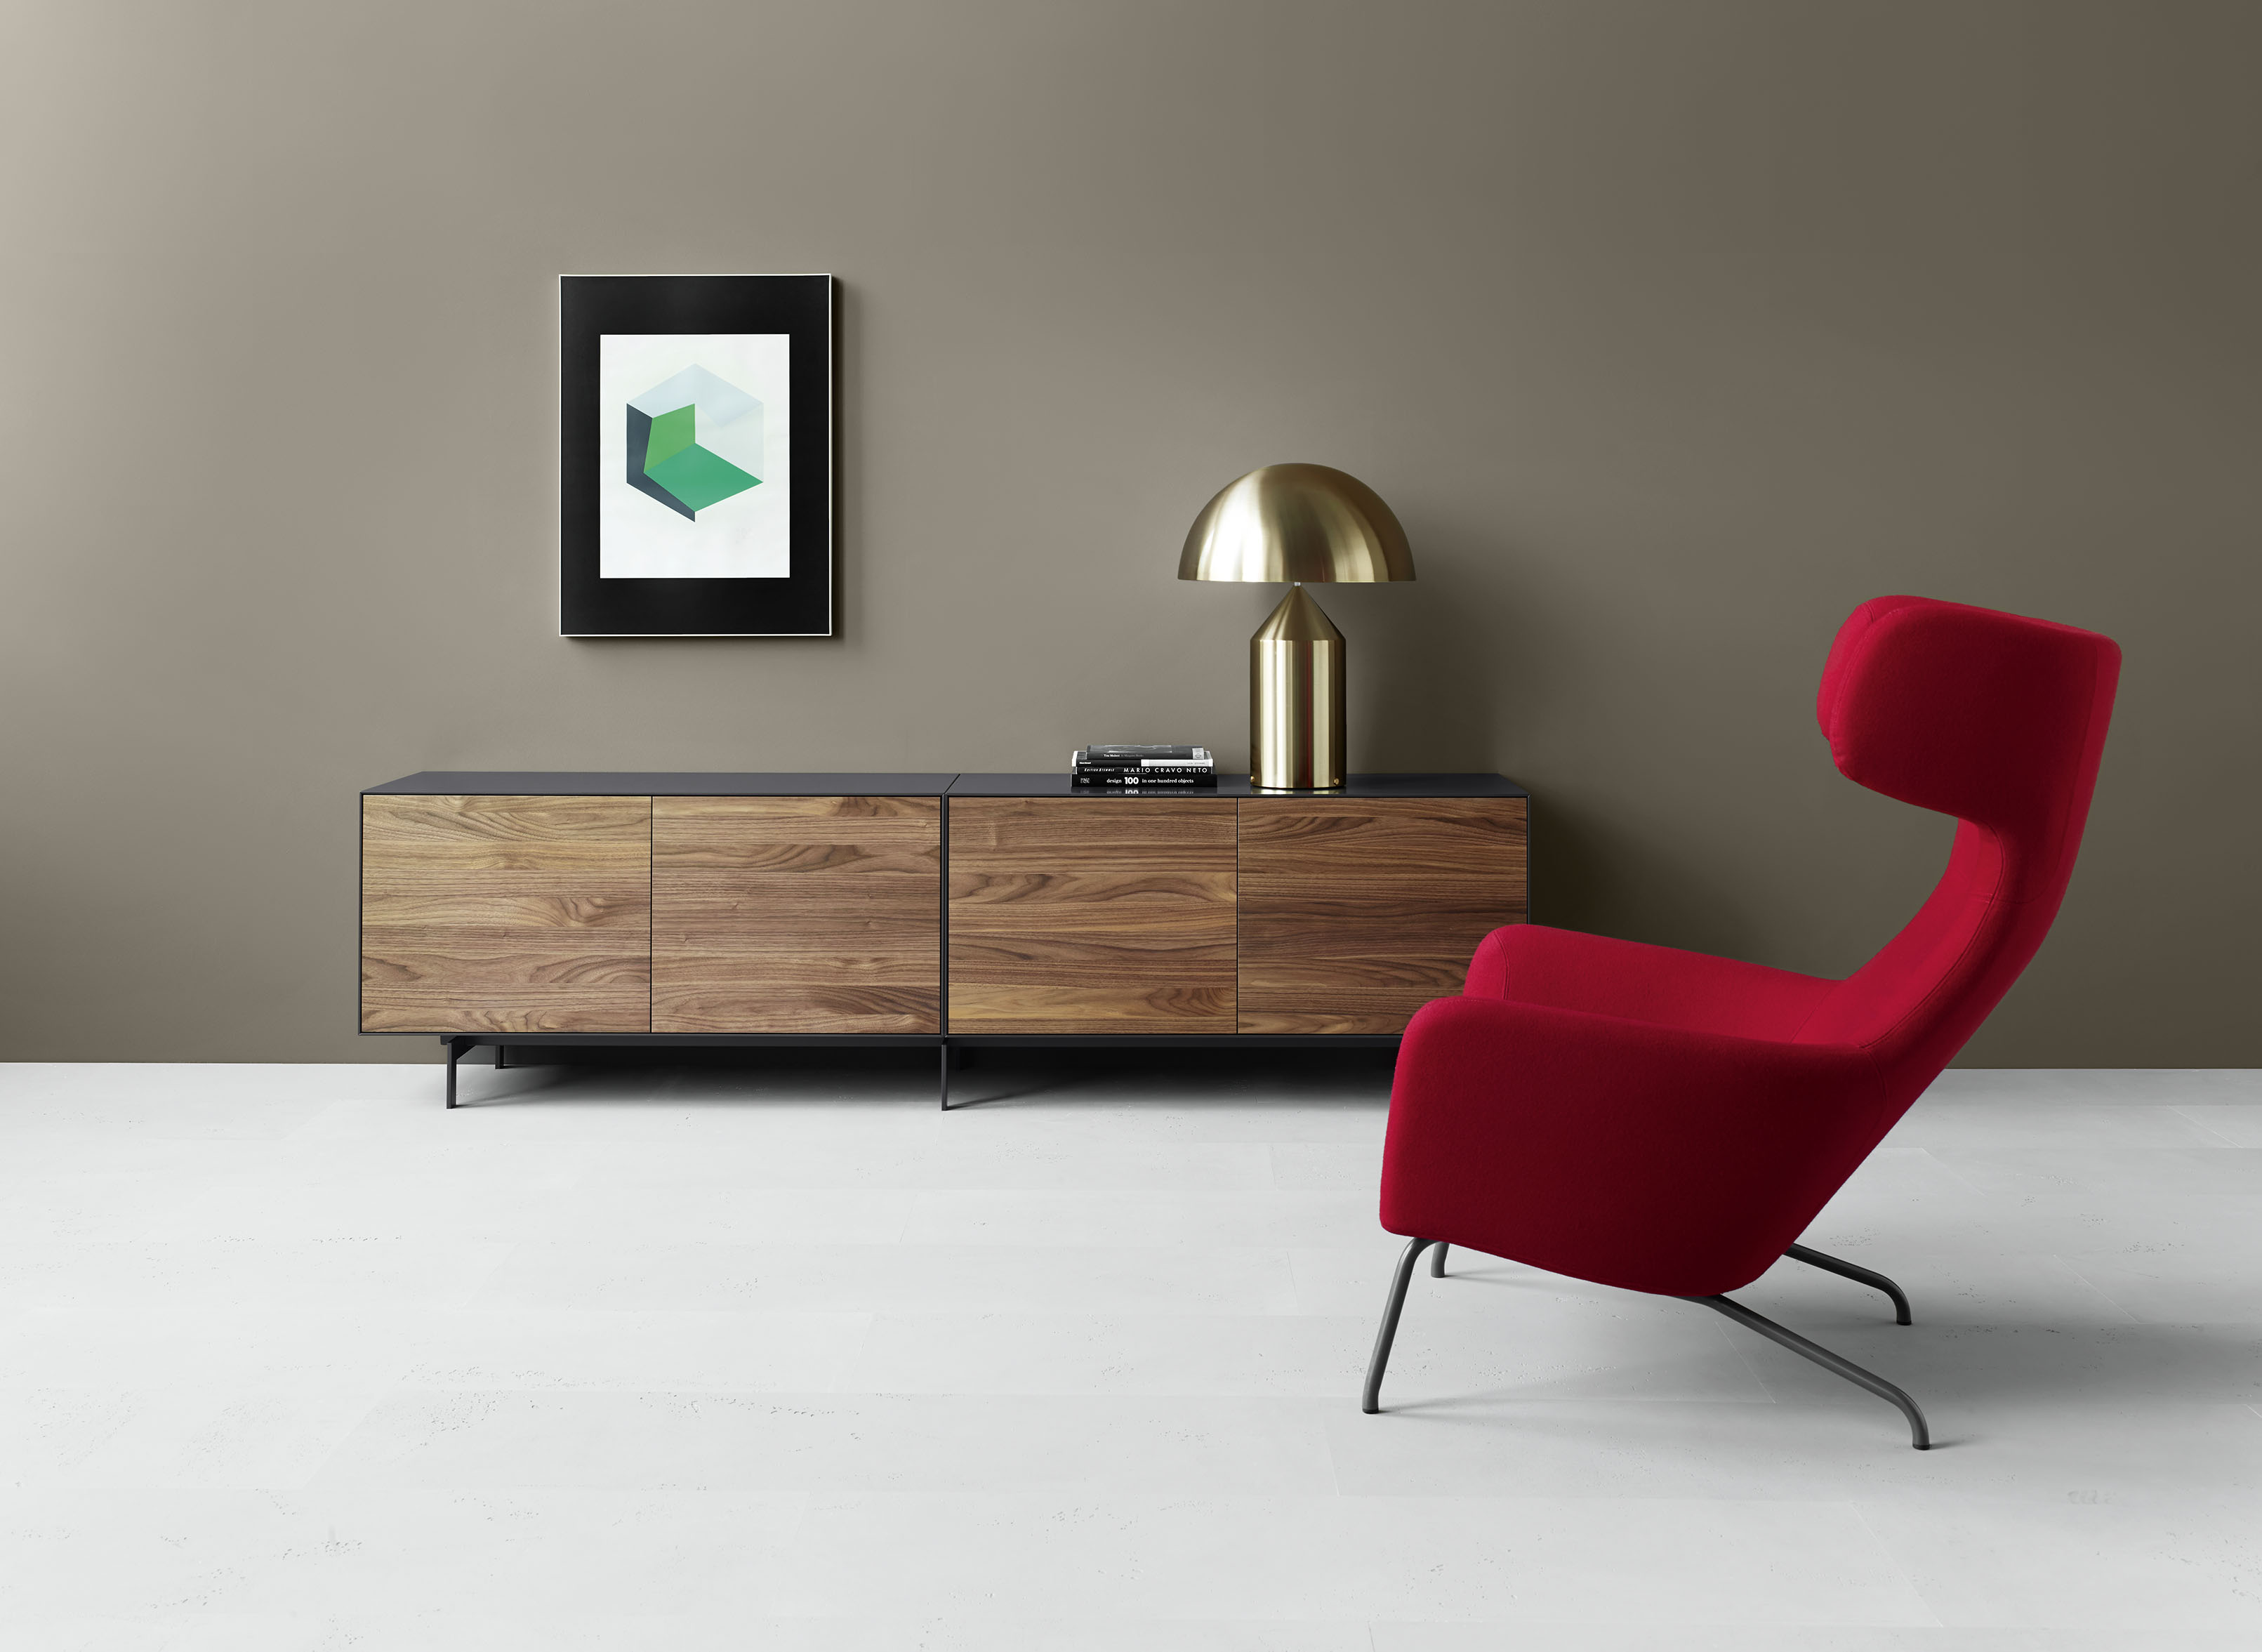 piure ramona reuter. Black Bedroom Furniture Sets. Home Design Ideas